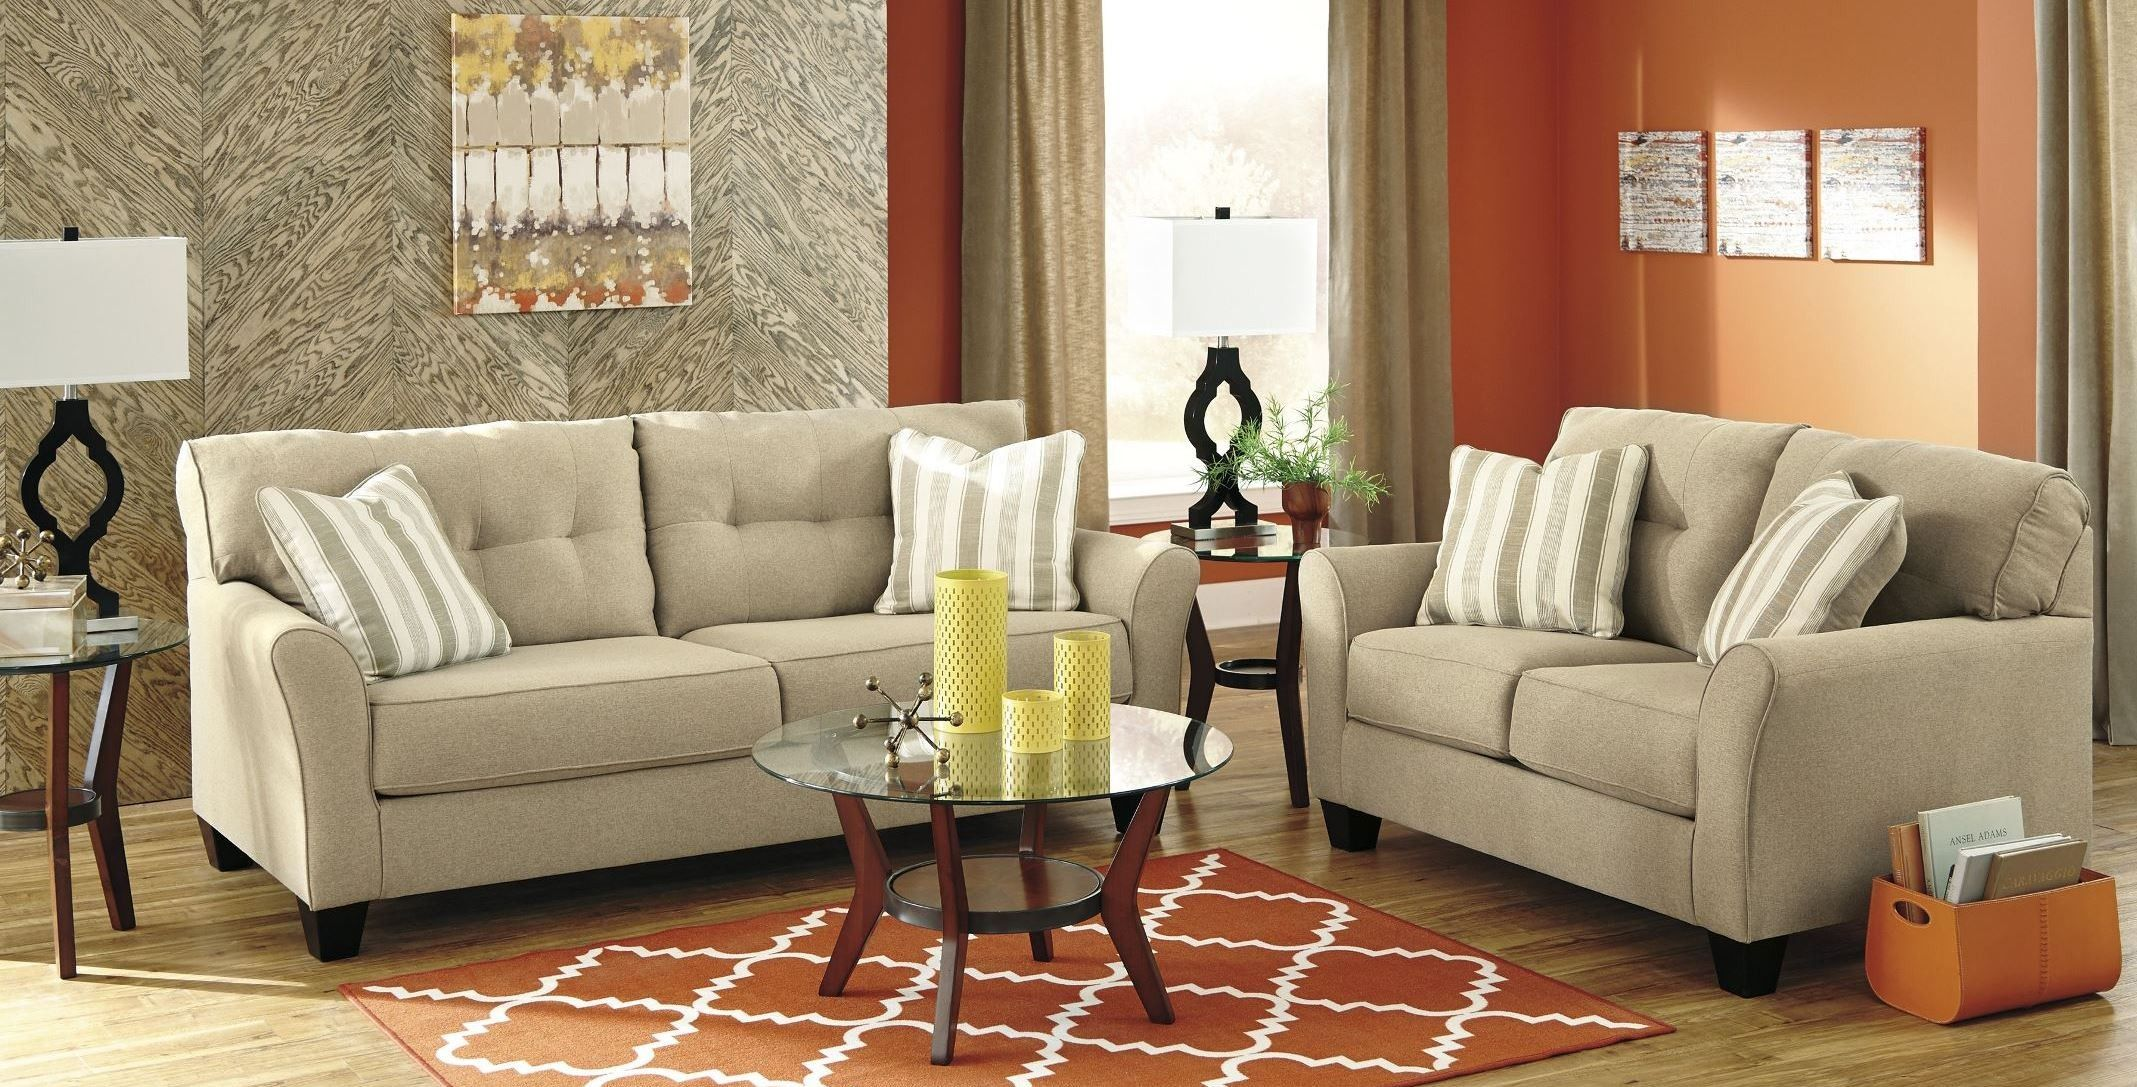 Ashley Furniture Furniture Furniture Sofa Set Ashley Furniture